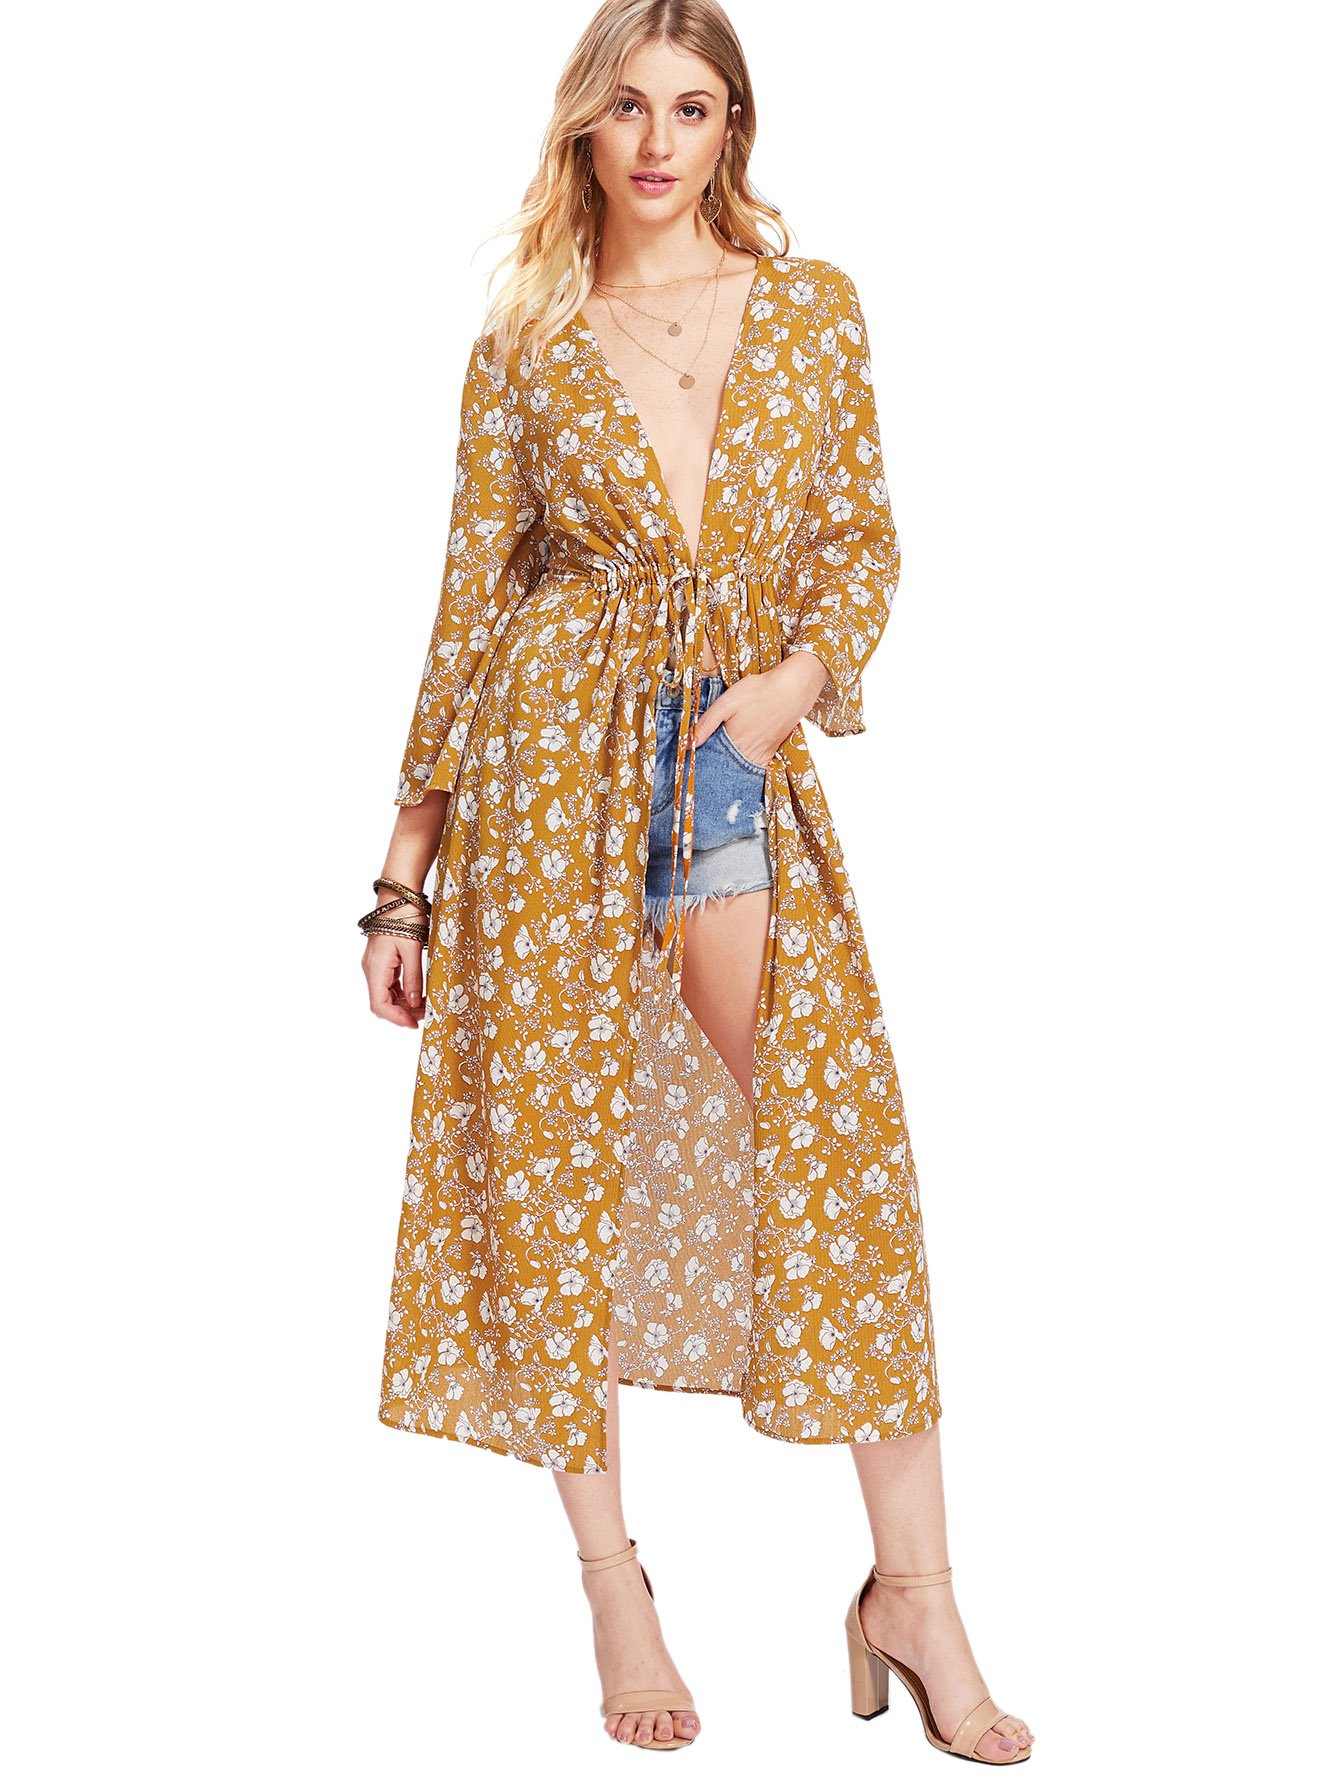 SweatyRocks Women's Beach Cover Up Swimsuit Loose Floral Print Kimono Cardigan Capes Chiffon Blouse Multicolor M